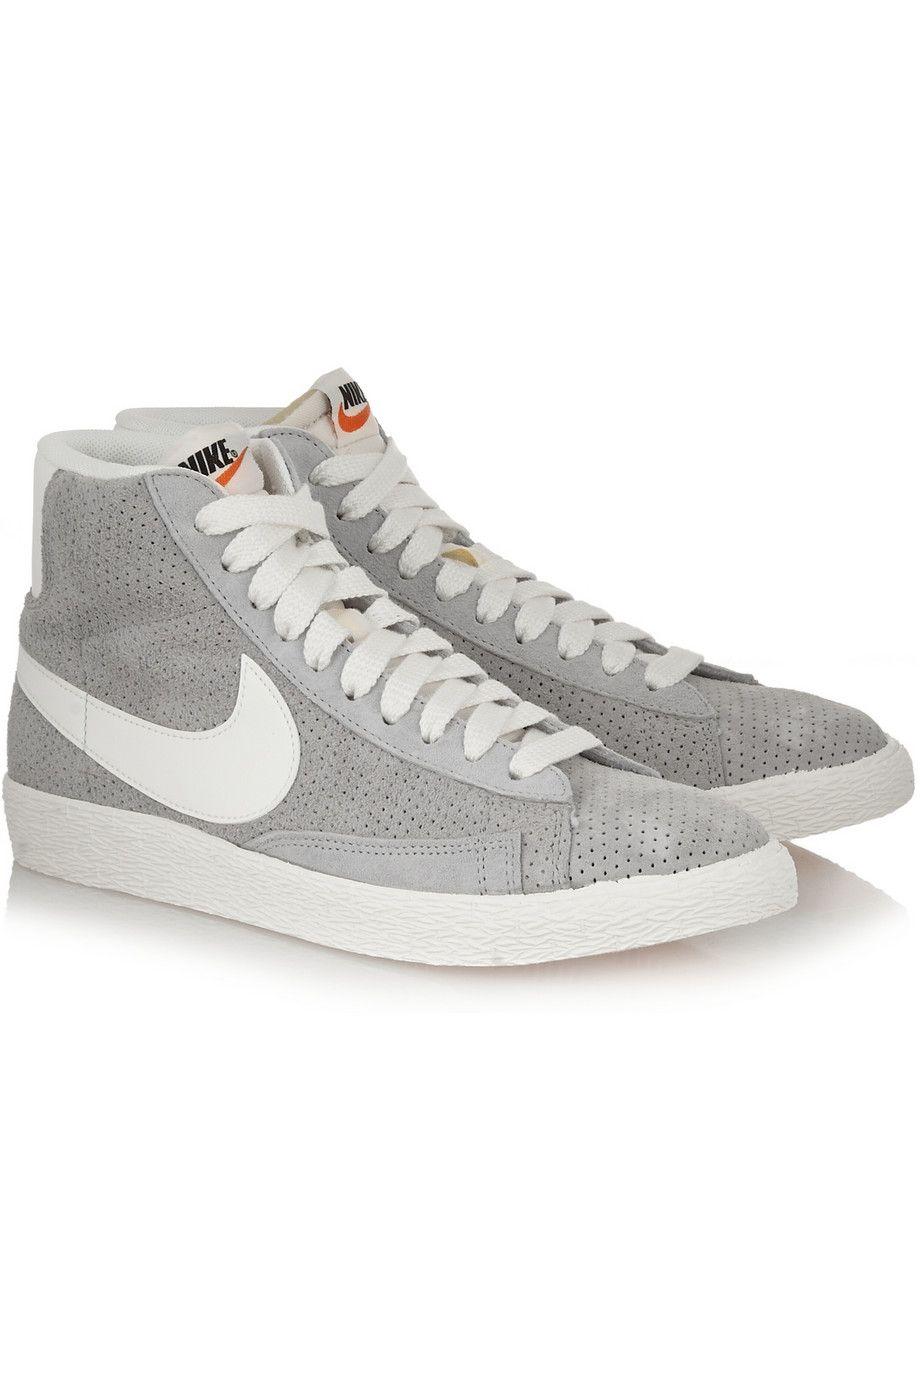 size 40 4a2da b9357 Nike   Blazer perforated suede high-top sneakers   NET-A-PORTER.COM